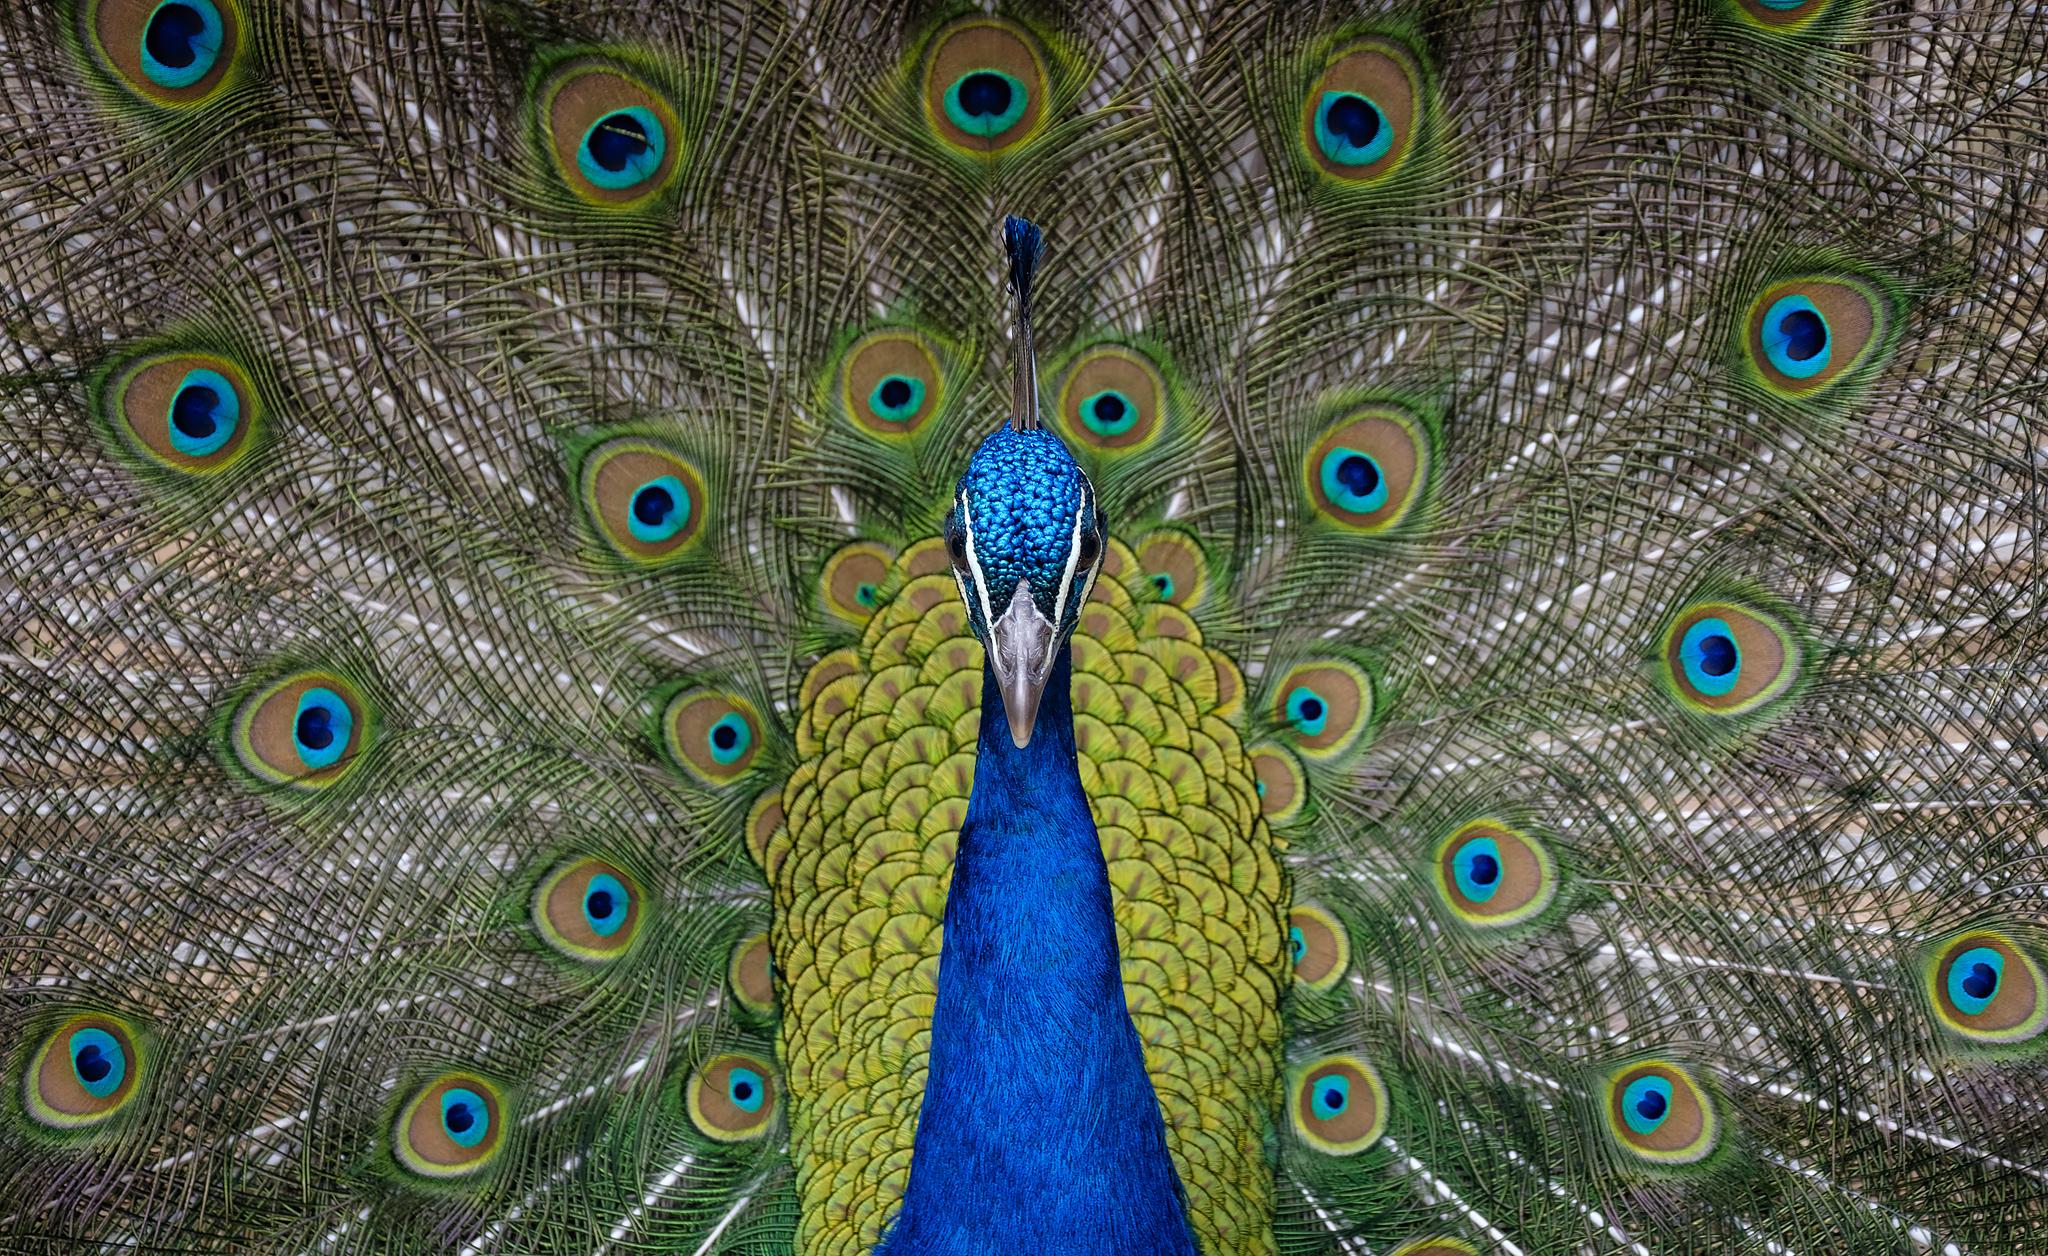 Peacock.jpg.e291d0559a044b2fabcef0999adc